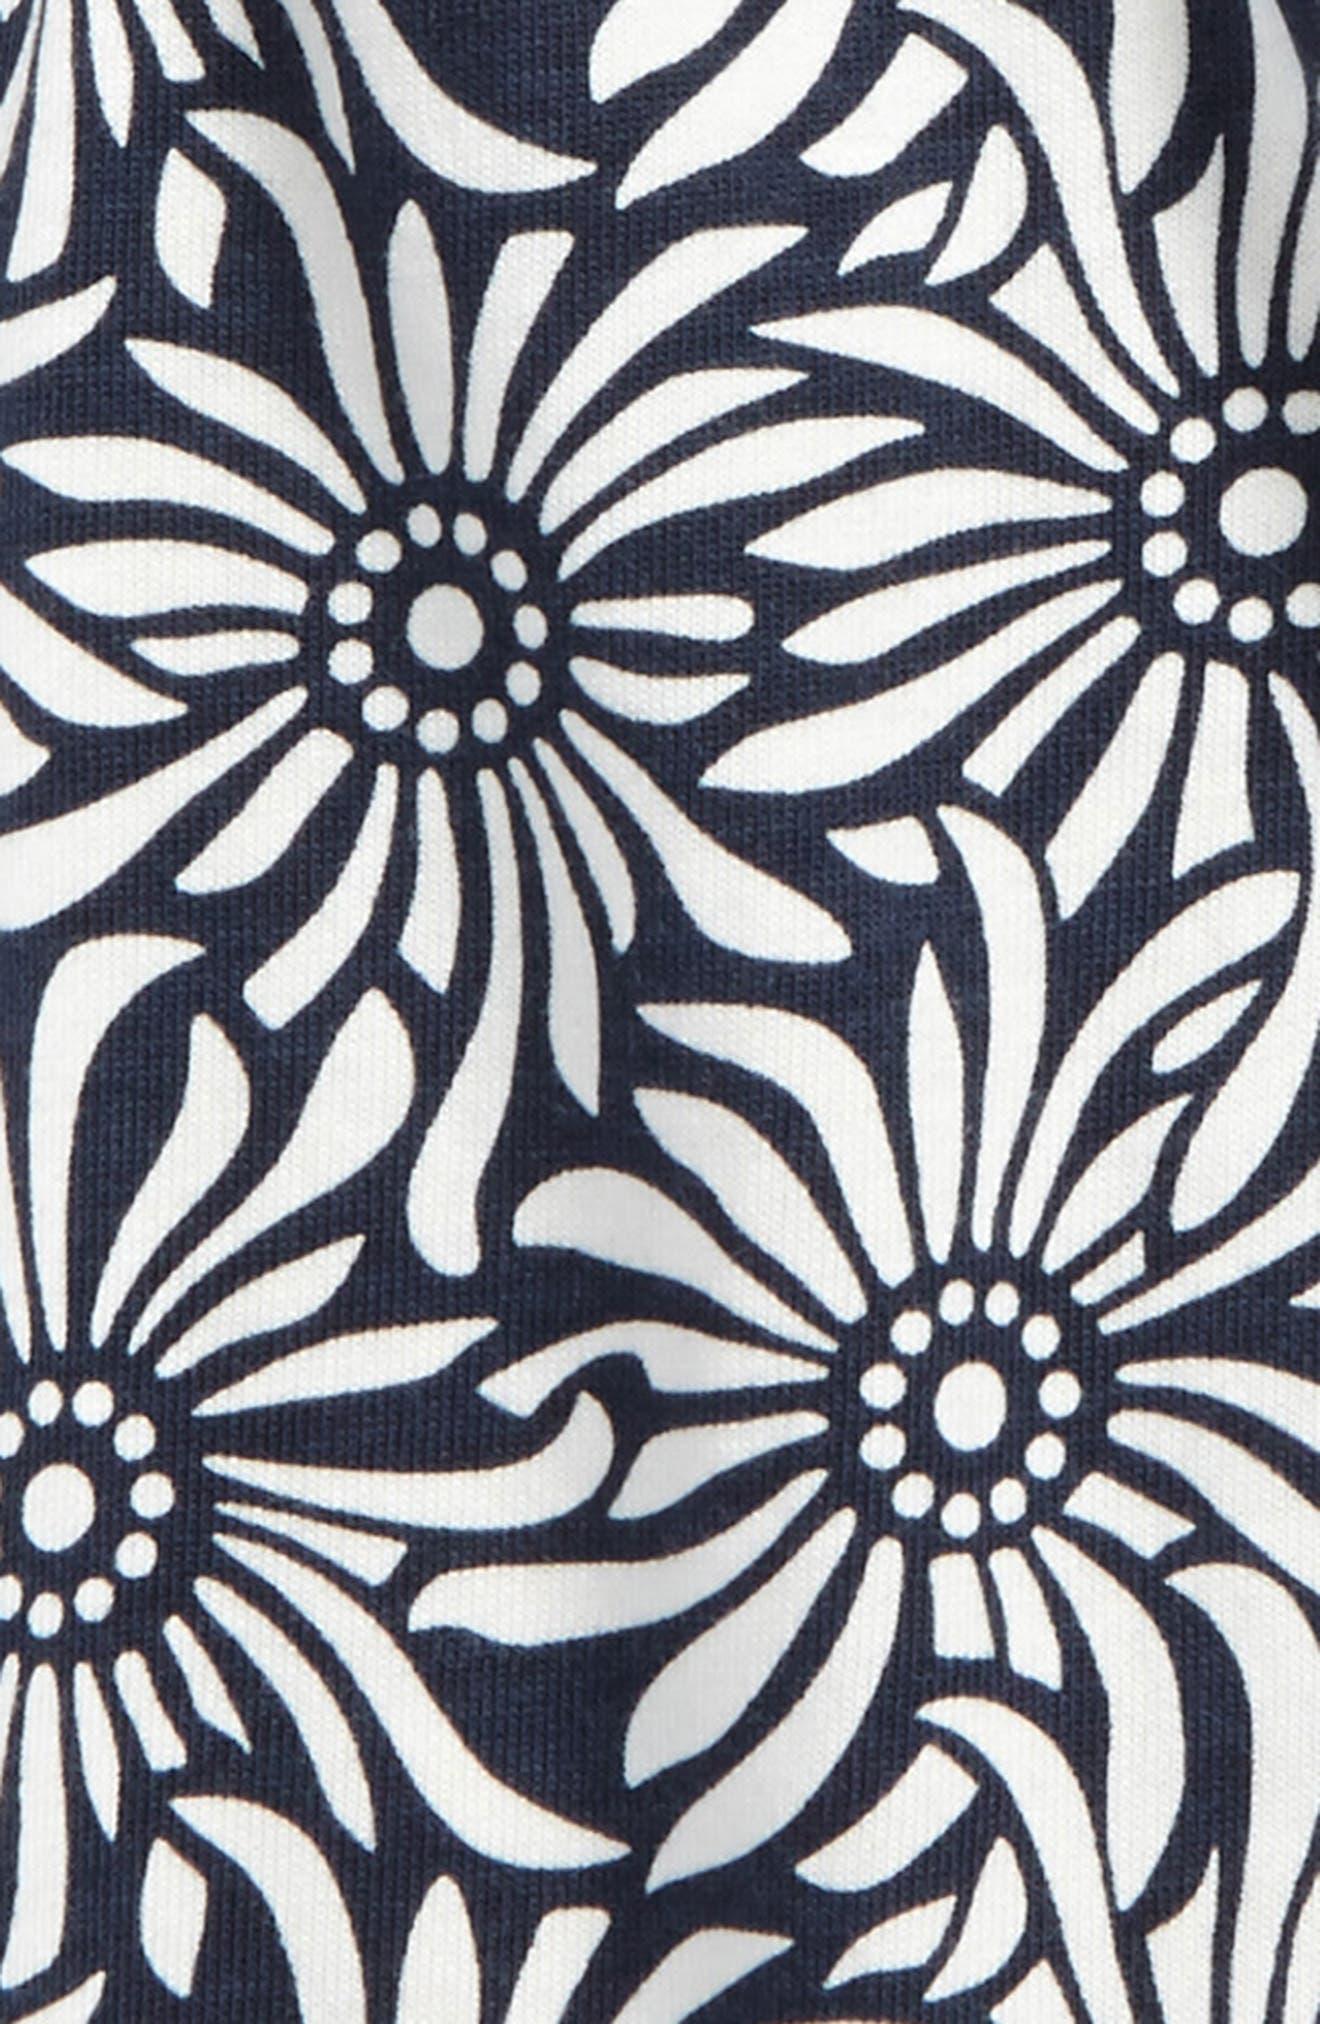 Daisy Field Shift Dress,                             Alternate thumbnail 2, color,